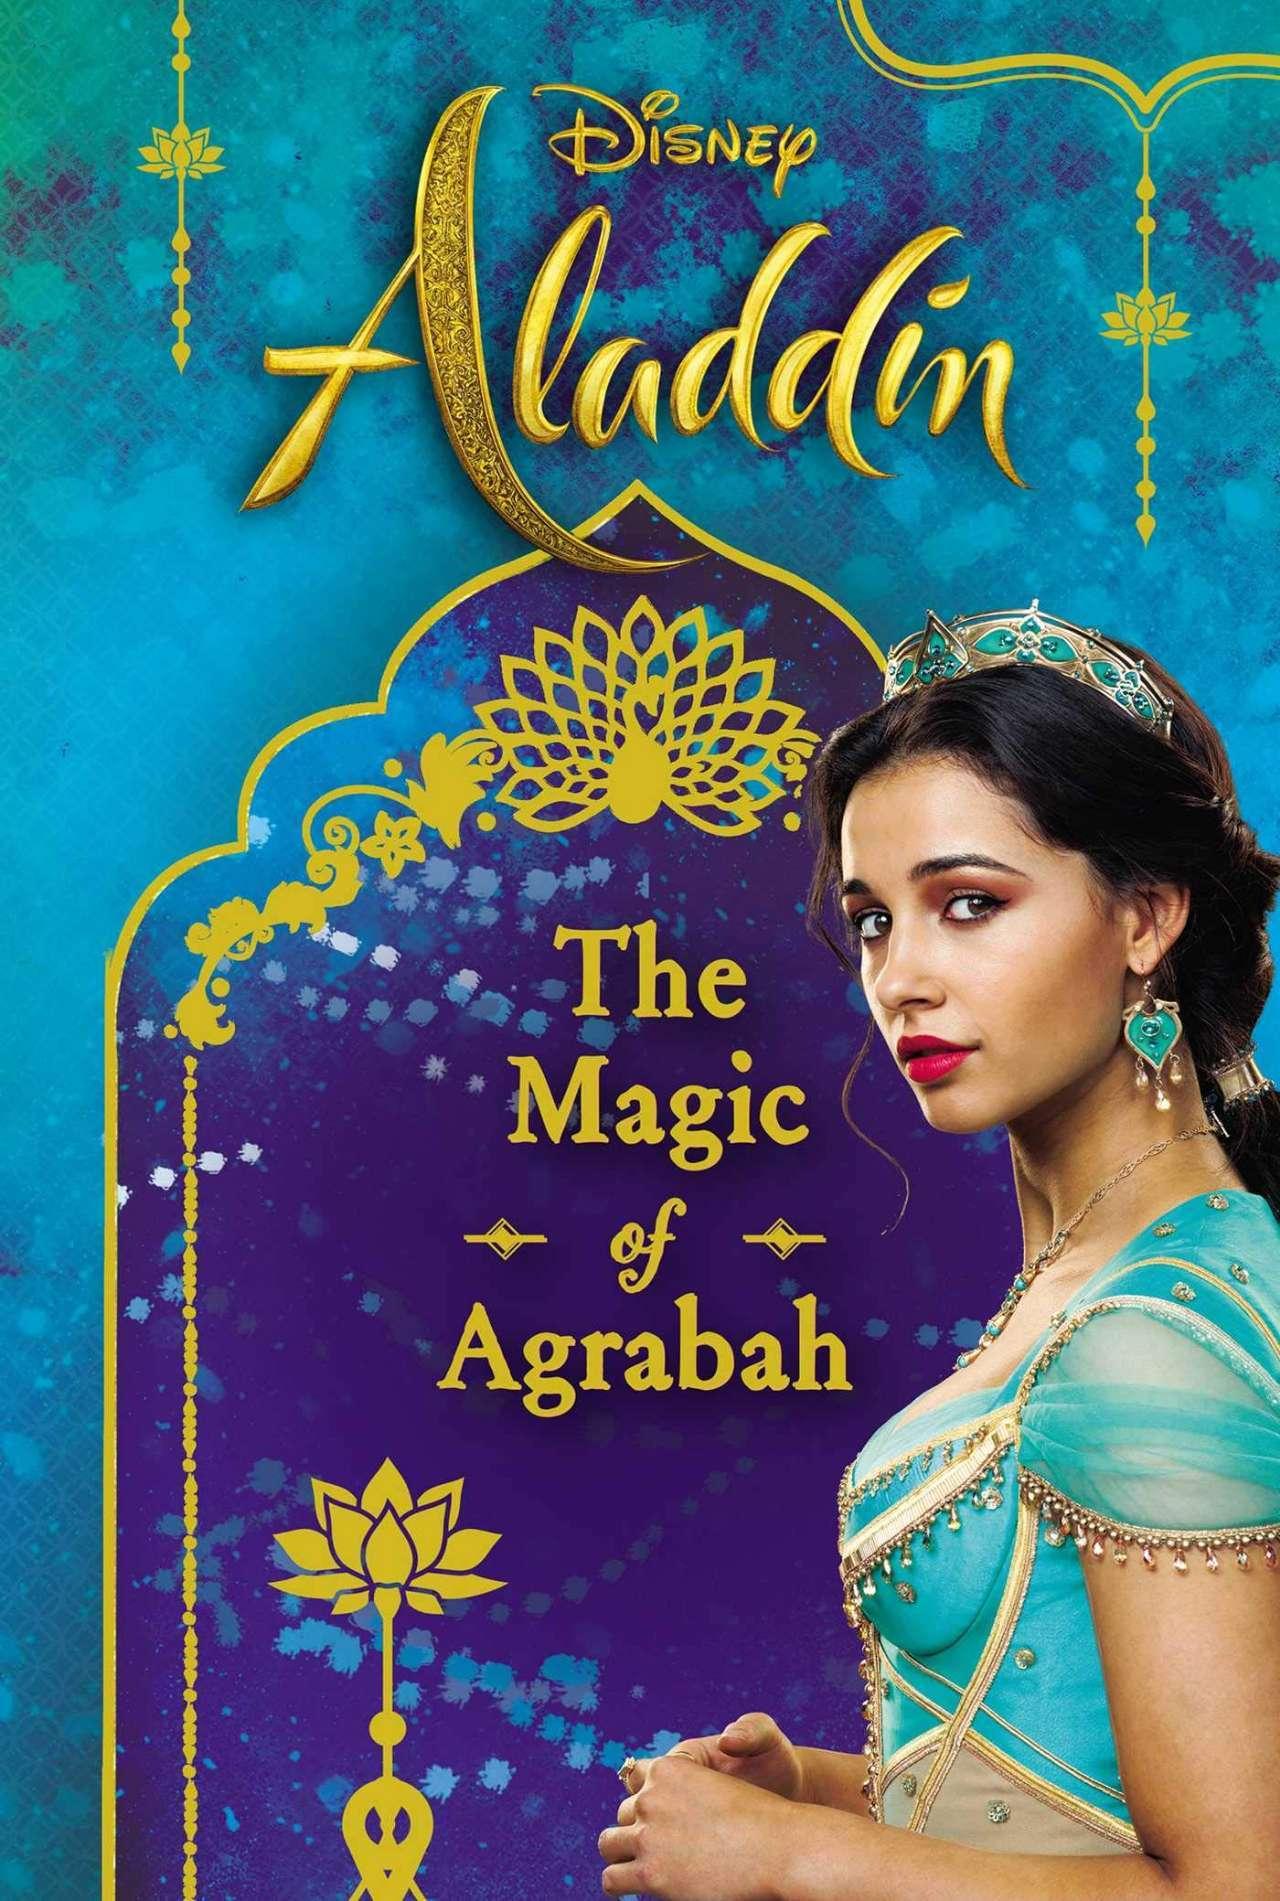 disneys aladdin jasmine the magic of agrabah